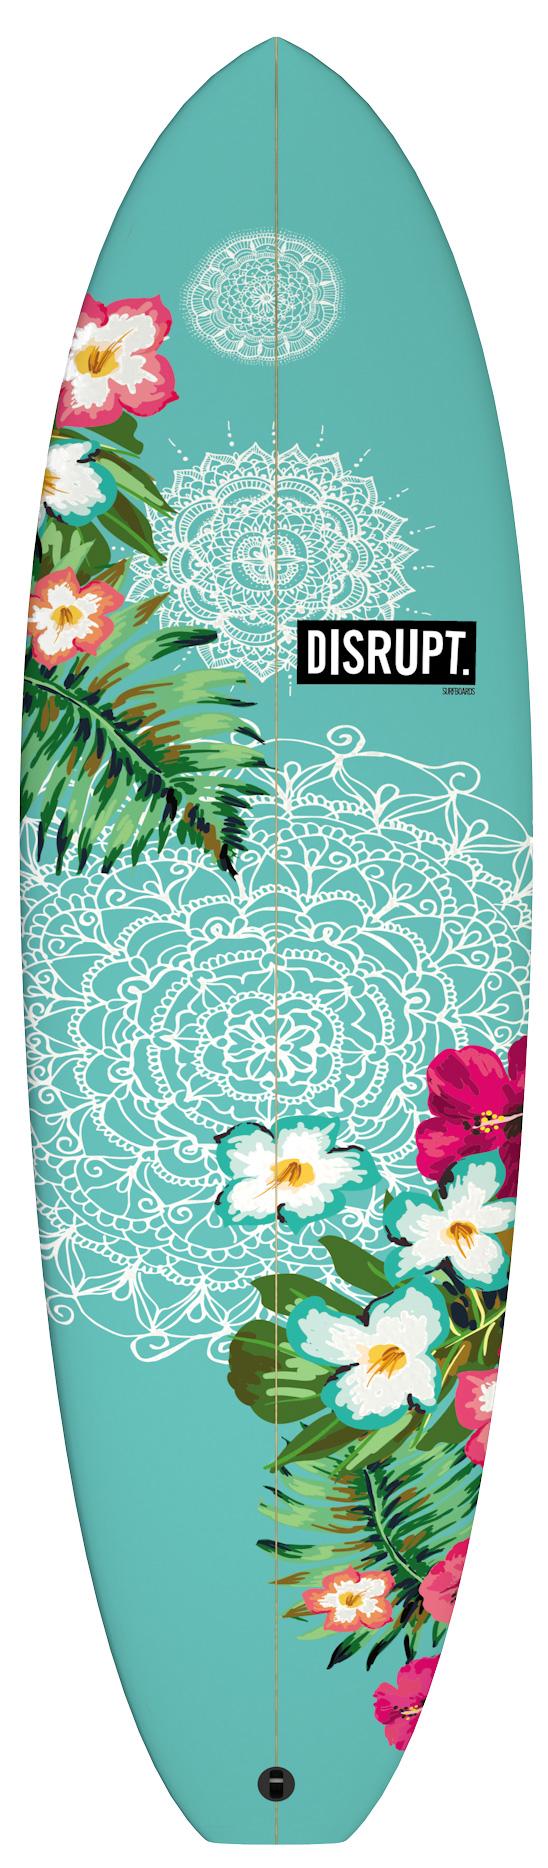 Retro Single Fin Surfboard Floral